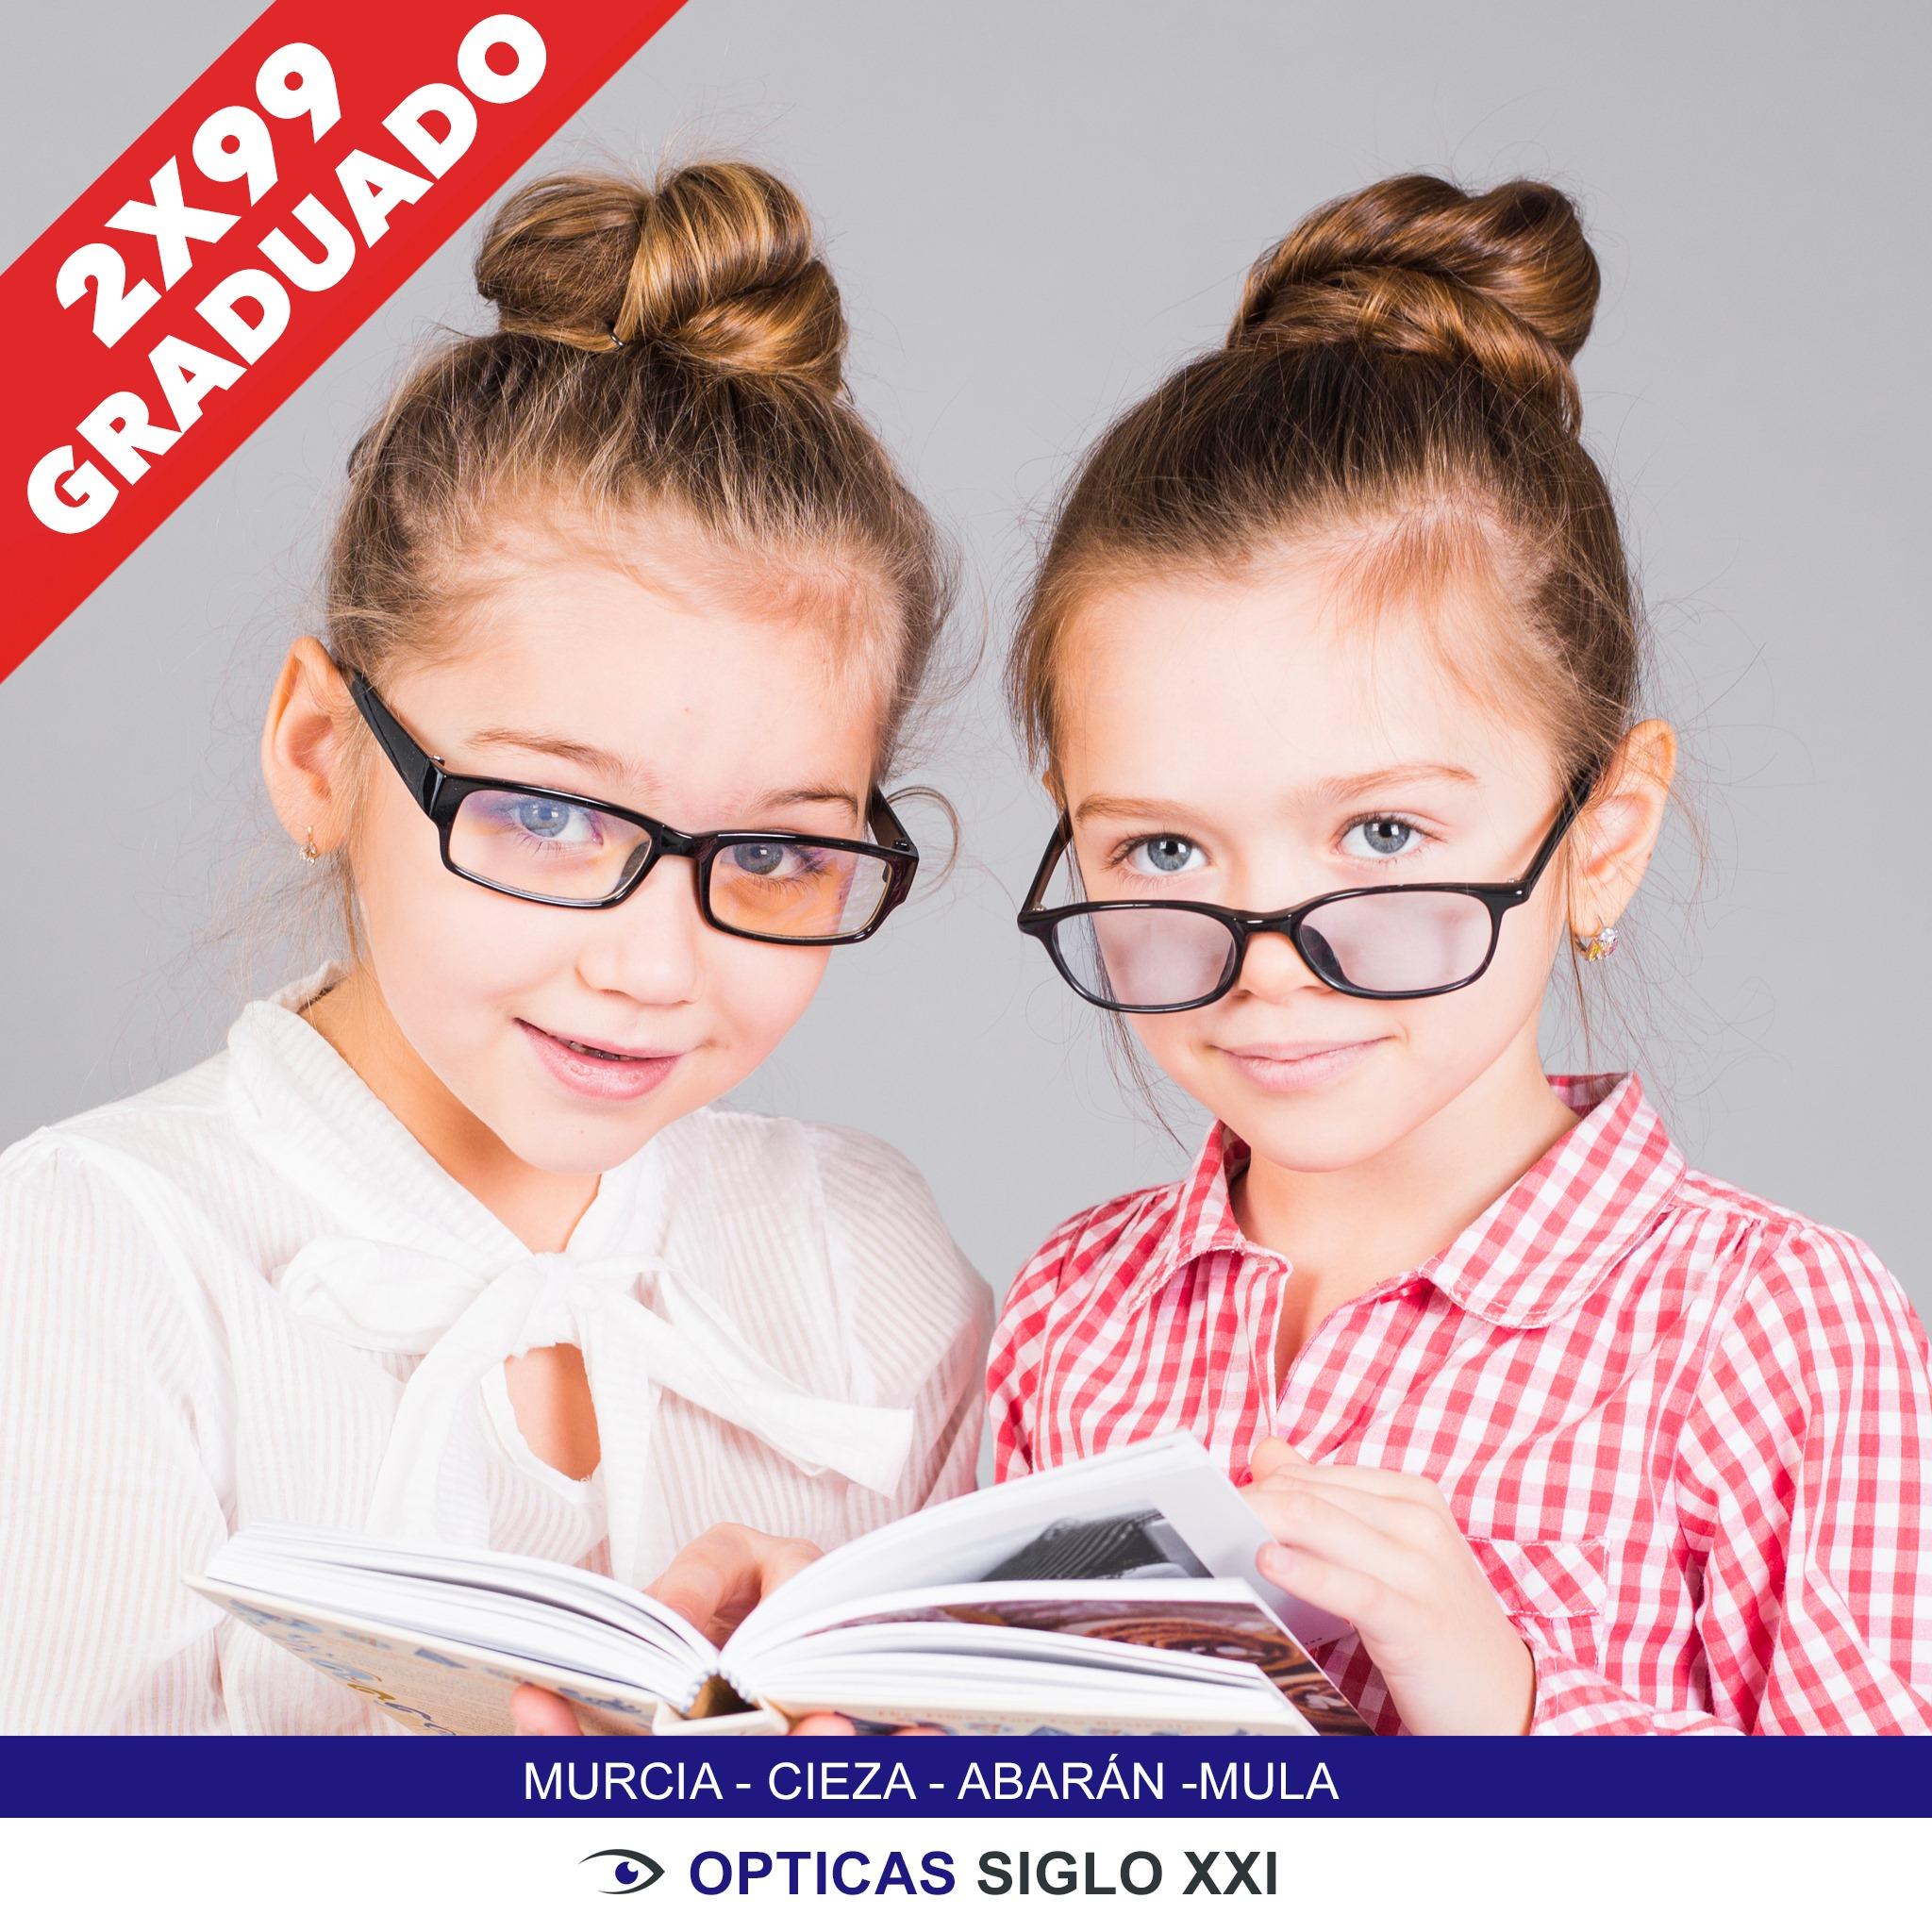 oferta-2x99-optica-gafas-graduadas